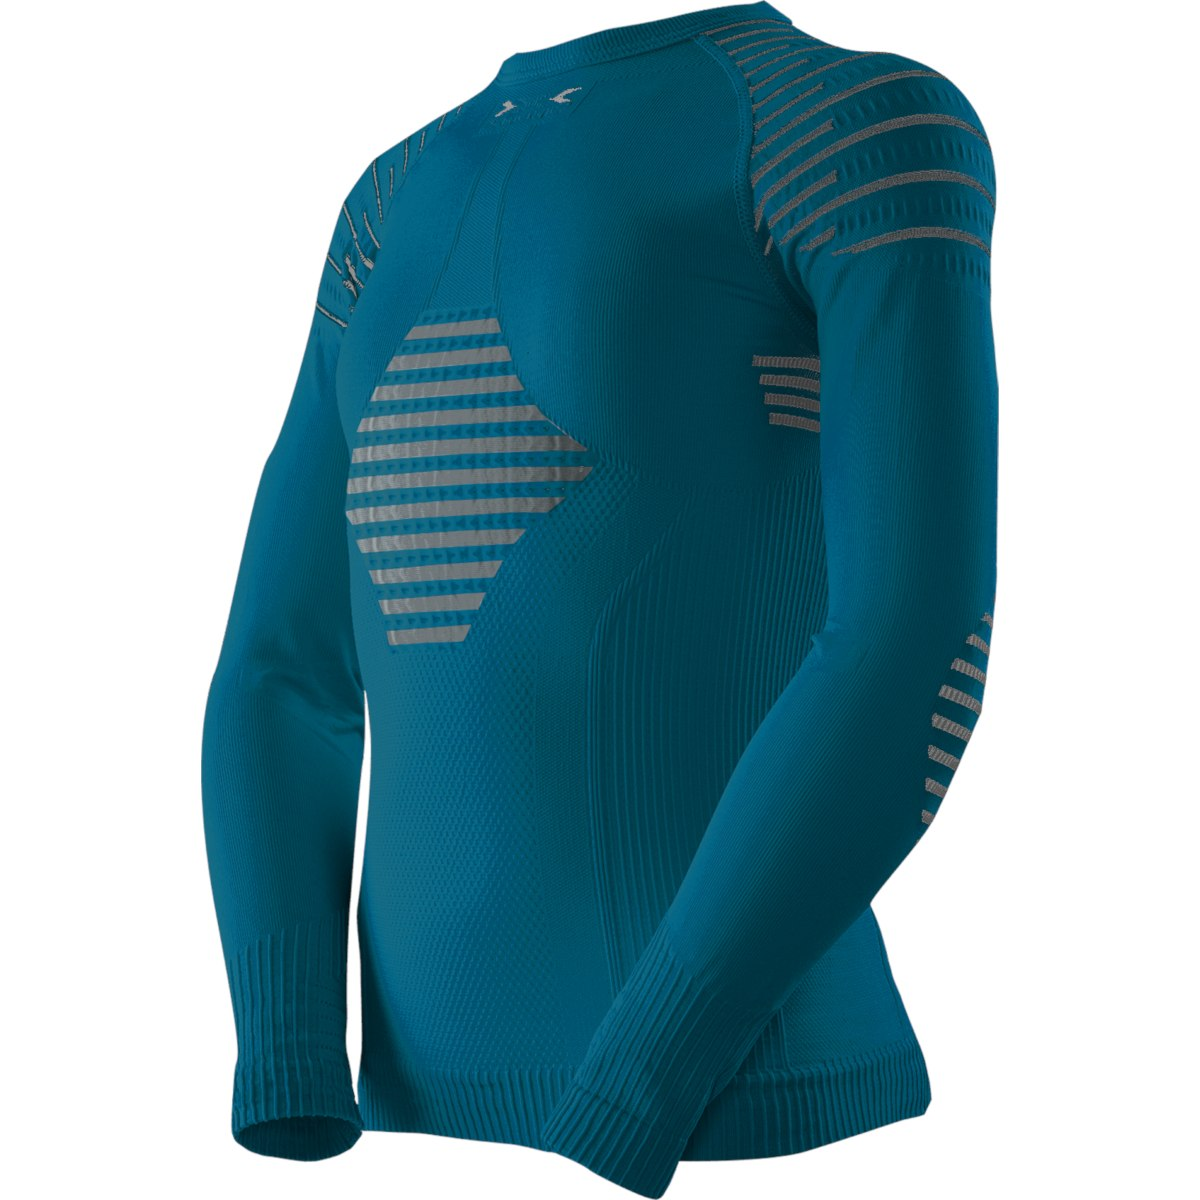 X-Bionic Invent 4.0 Shirt Round Neck Camiseta de manga larga para niños - teal blue/anthracite